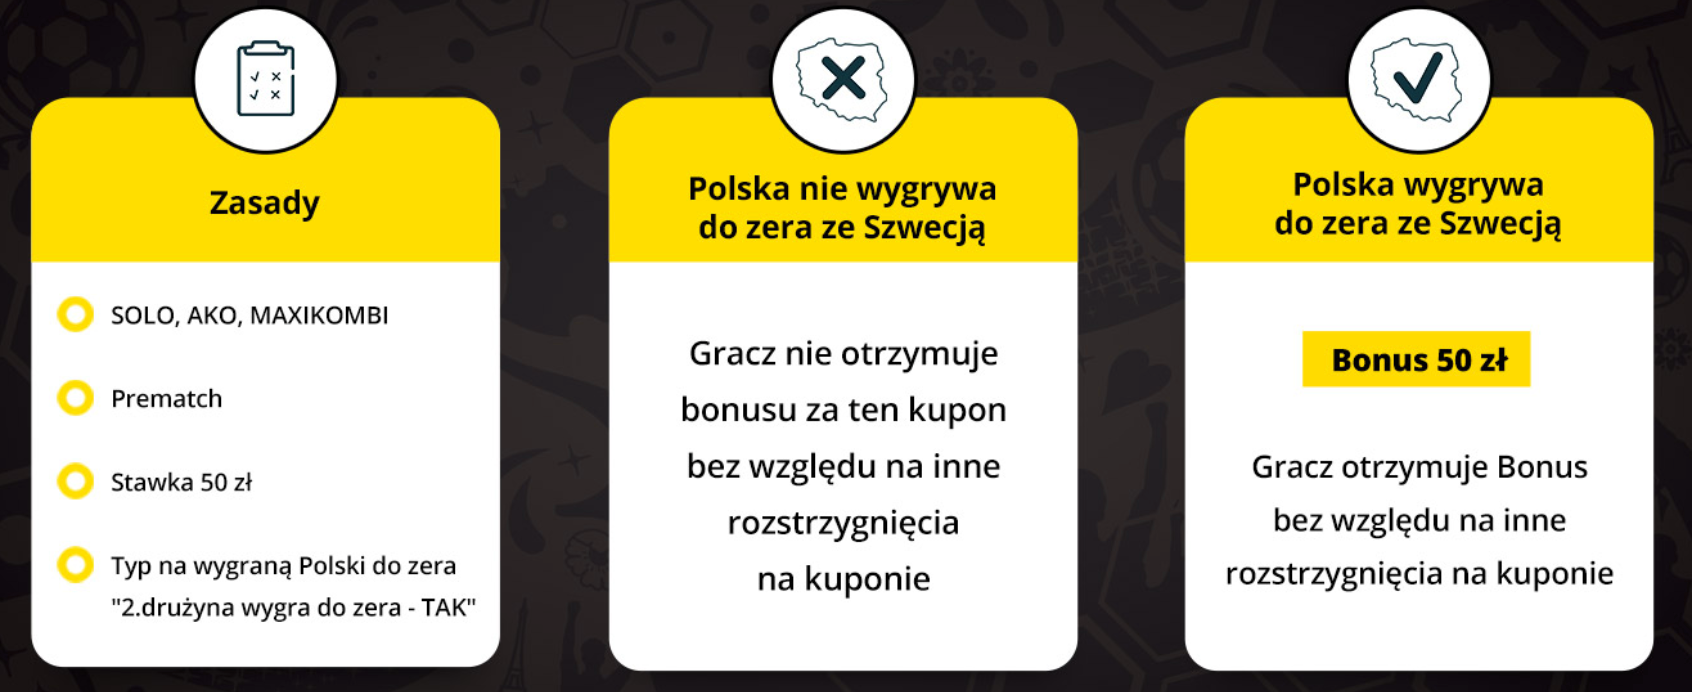 szwecja polska bonus